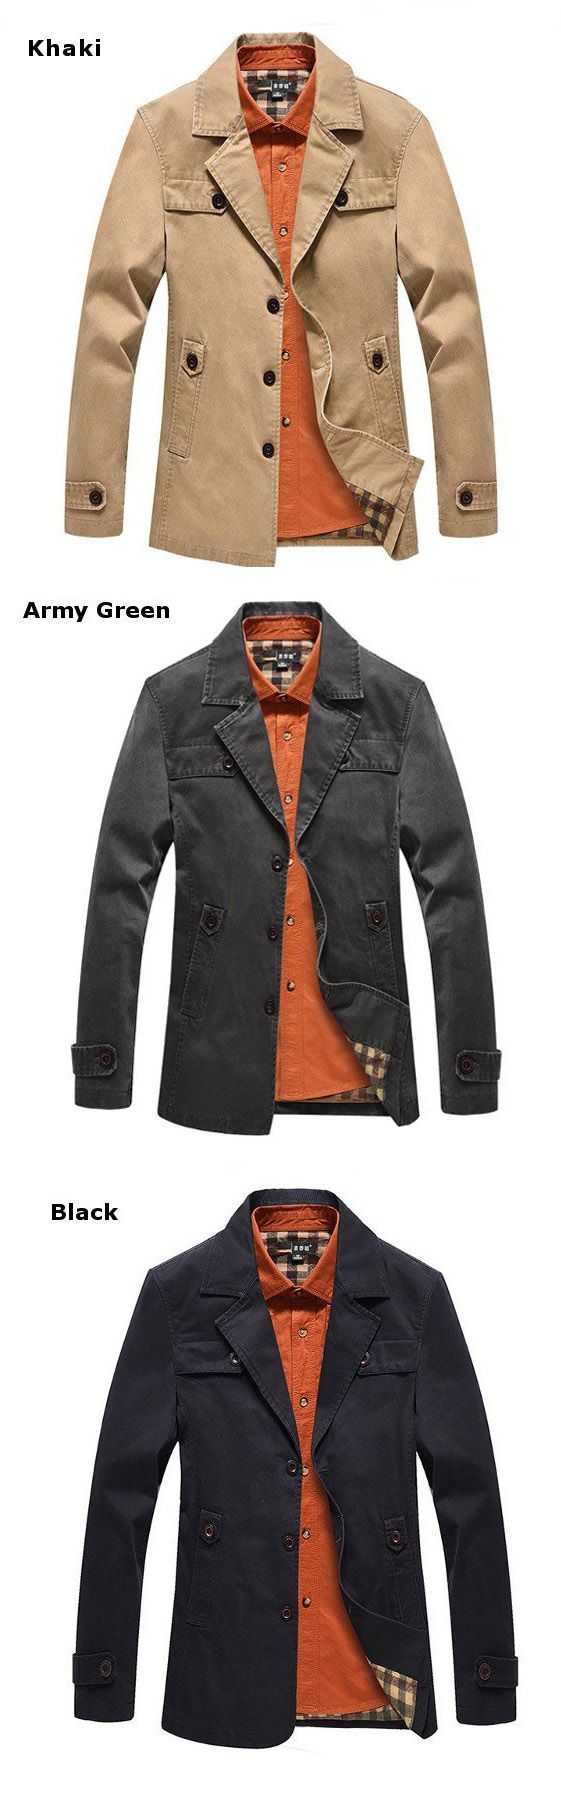 1168 best Men's coats and jackets images on Pinterest   Men's ...